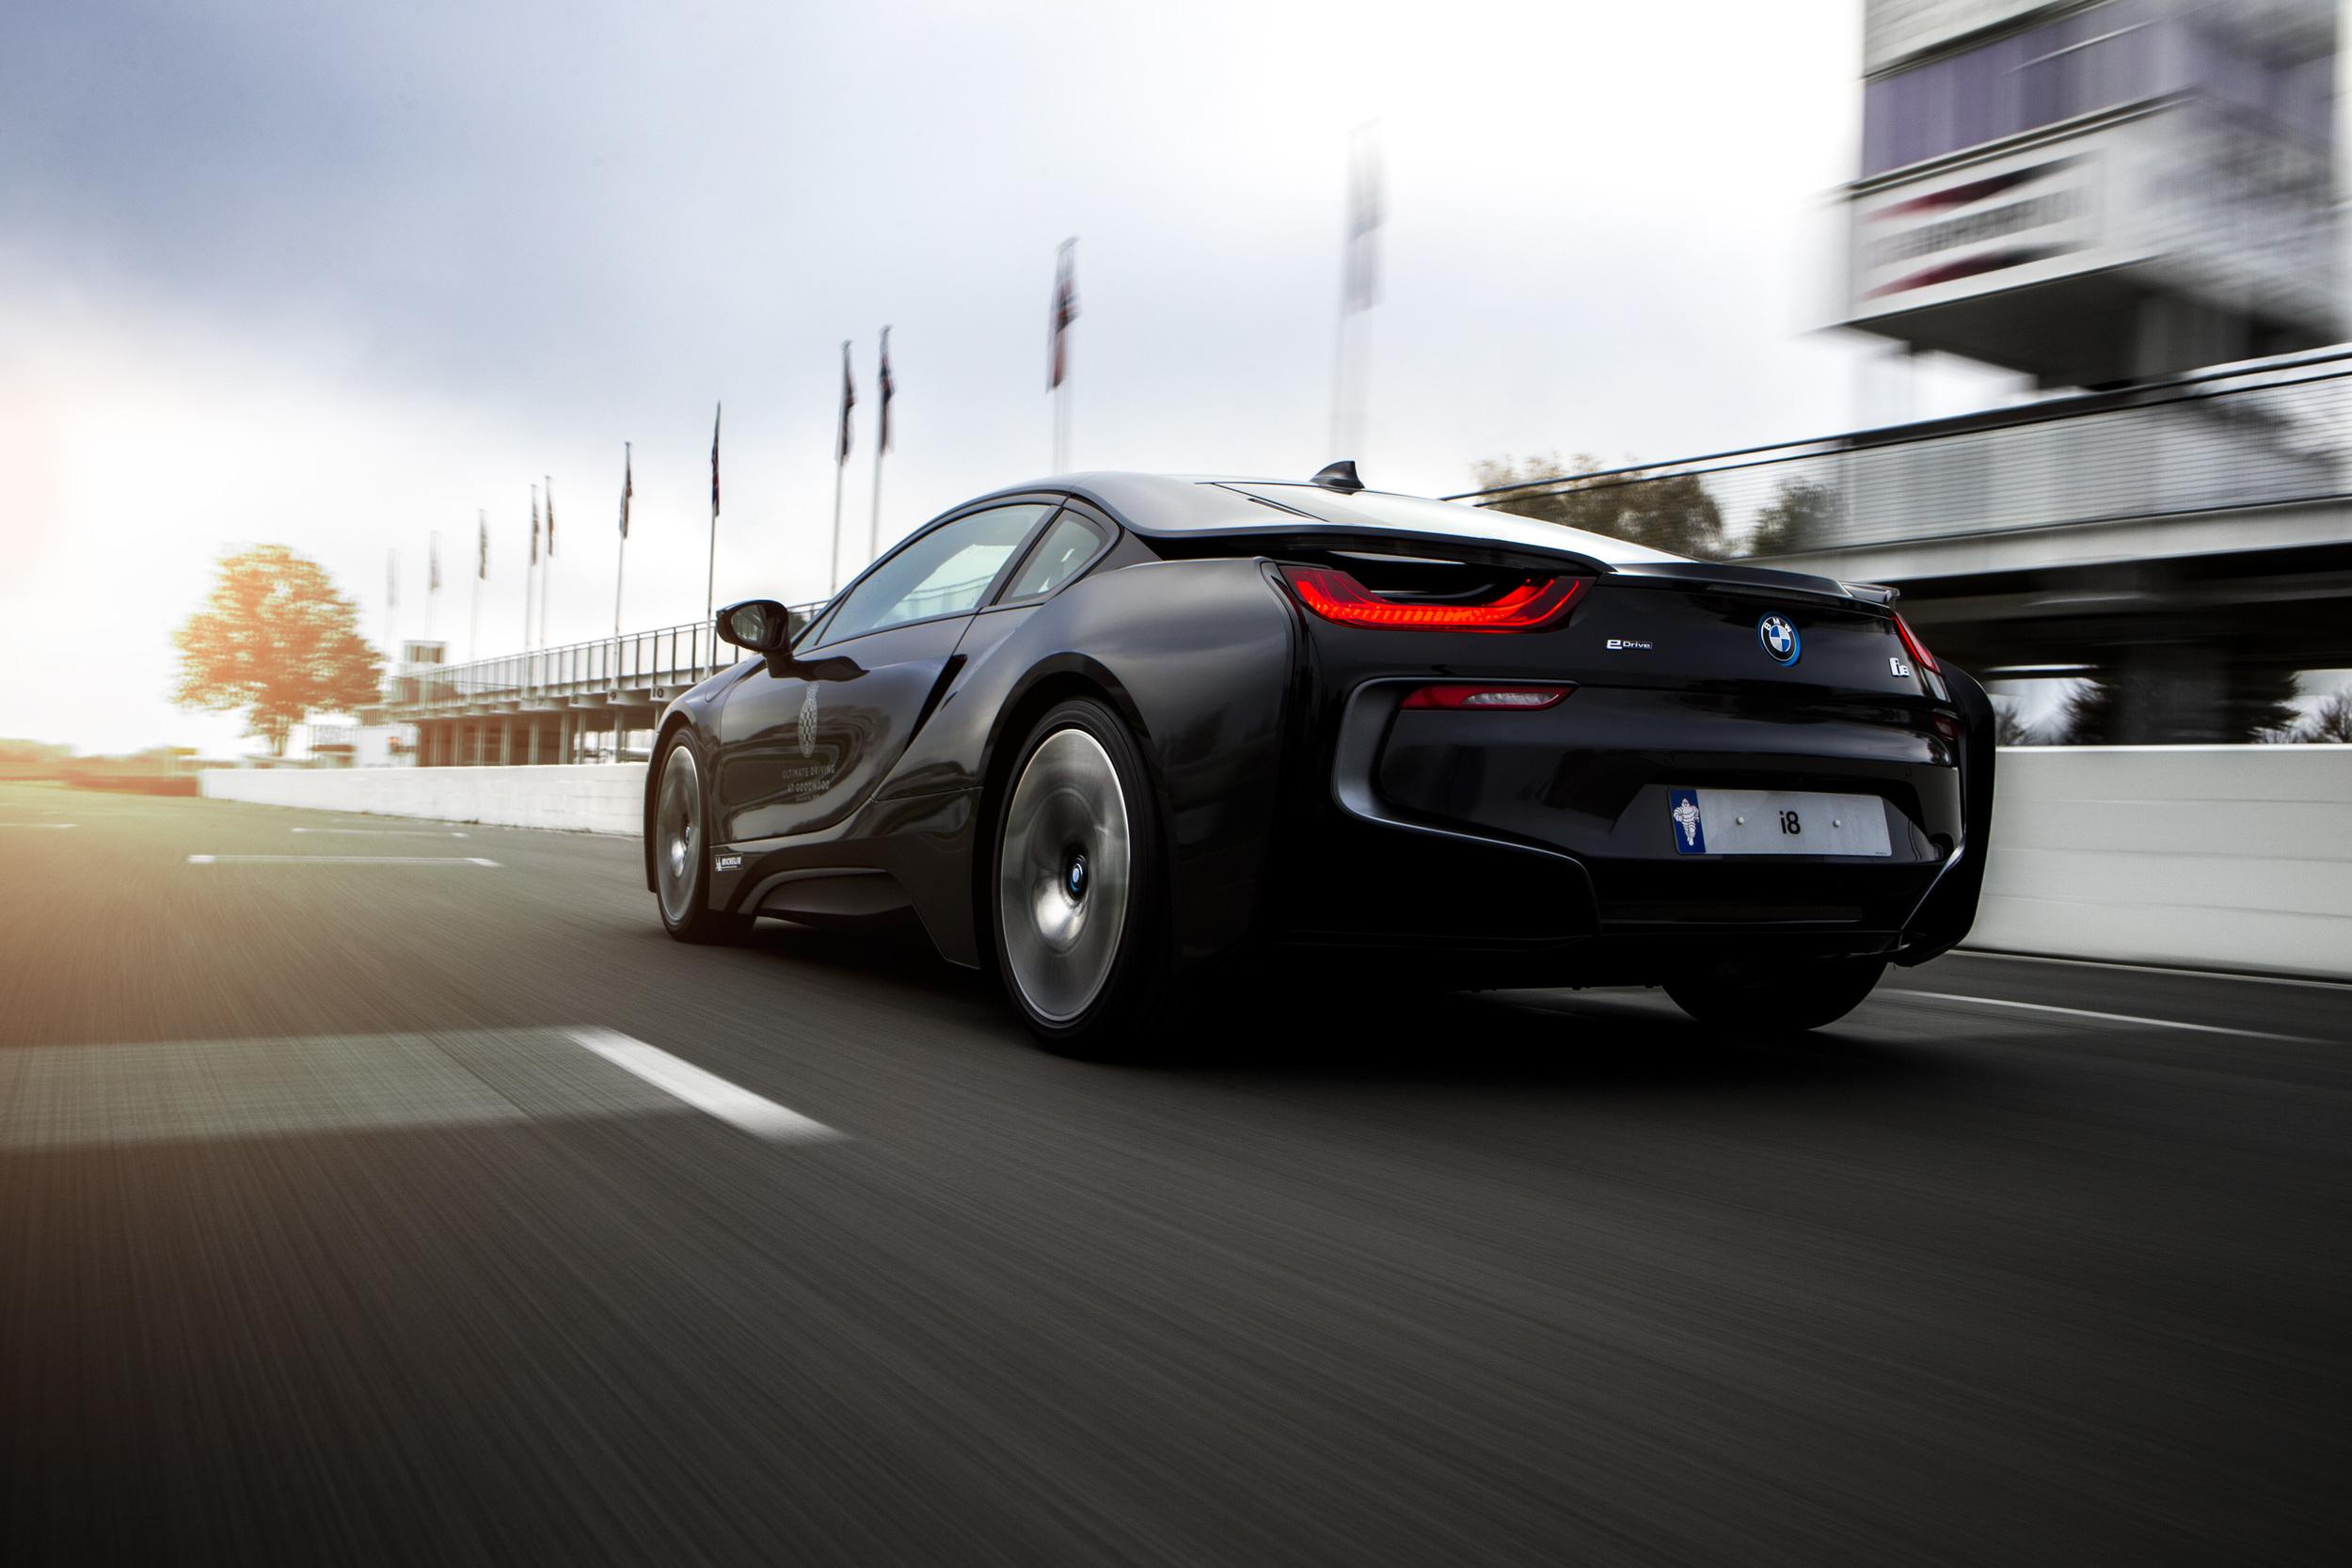 BMW i8 Rig Automotive Photography